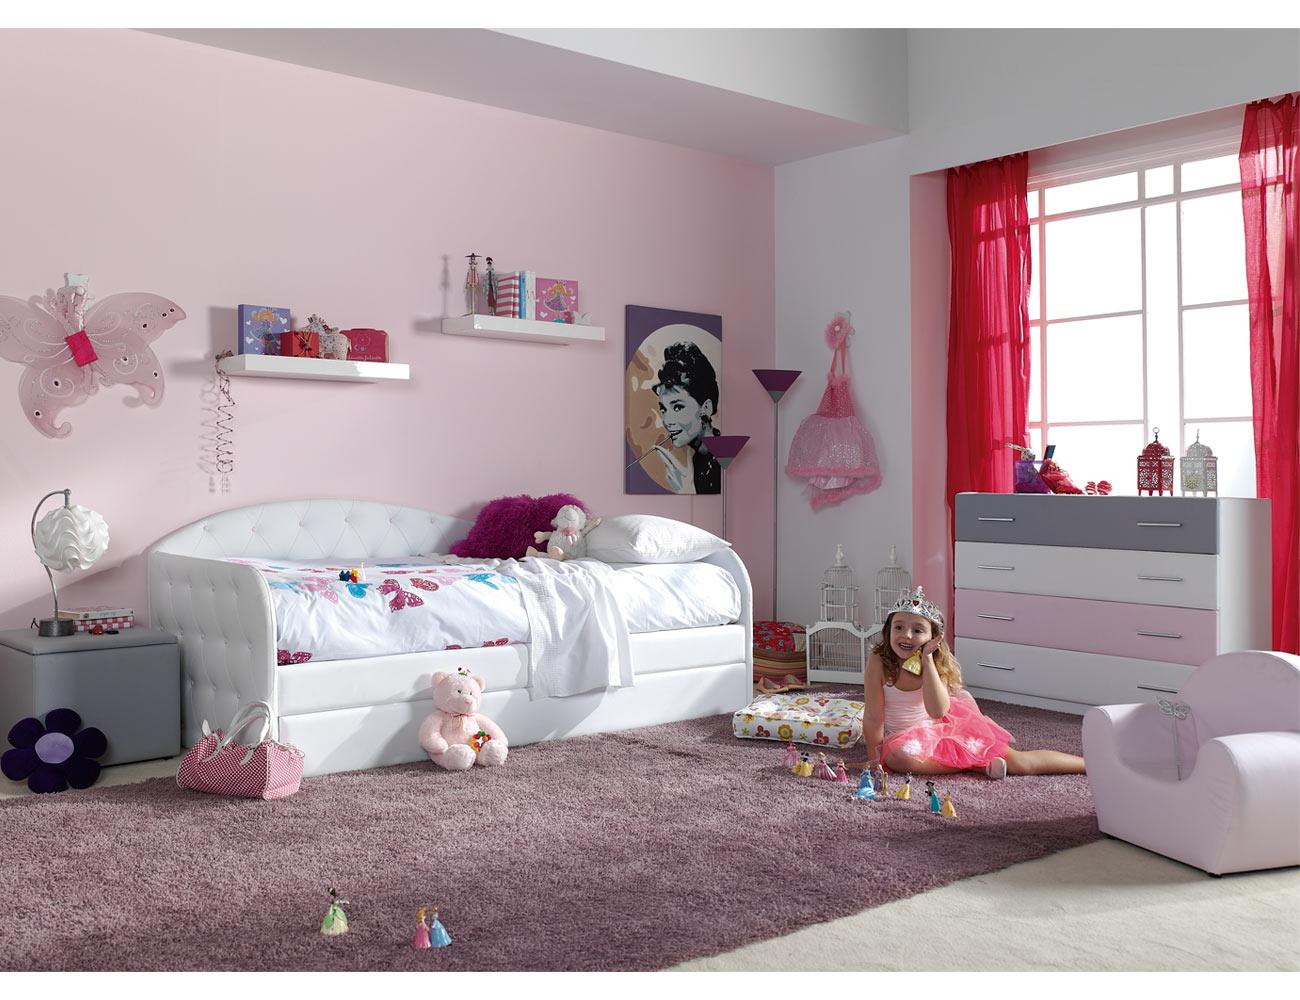 243 cama nido15